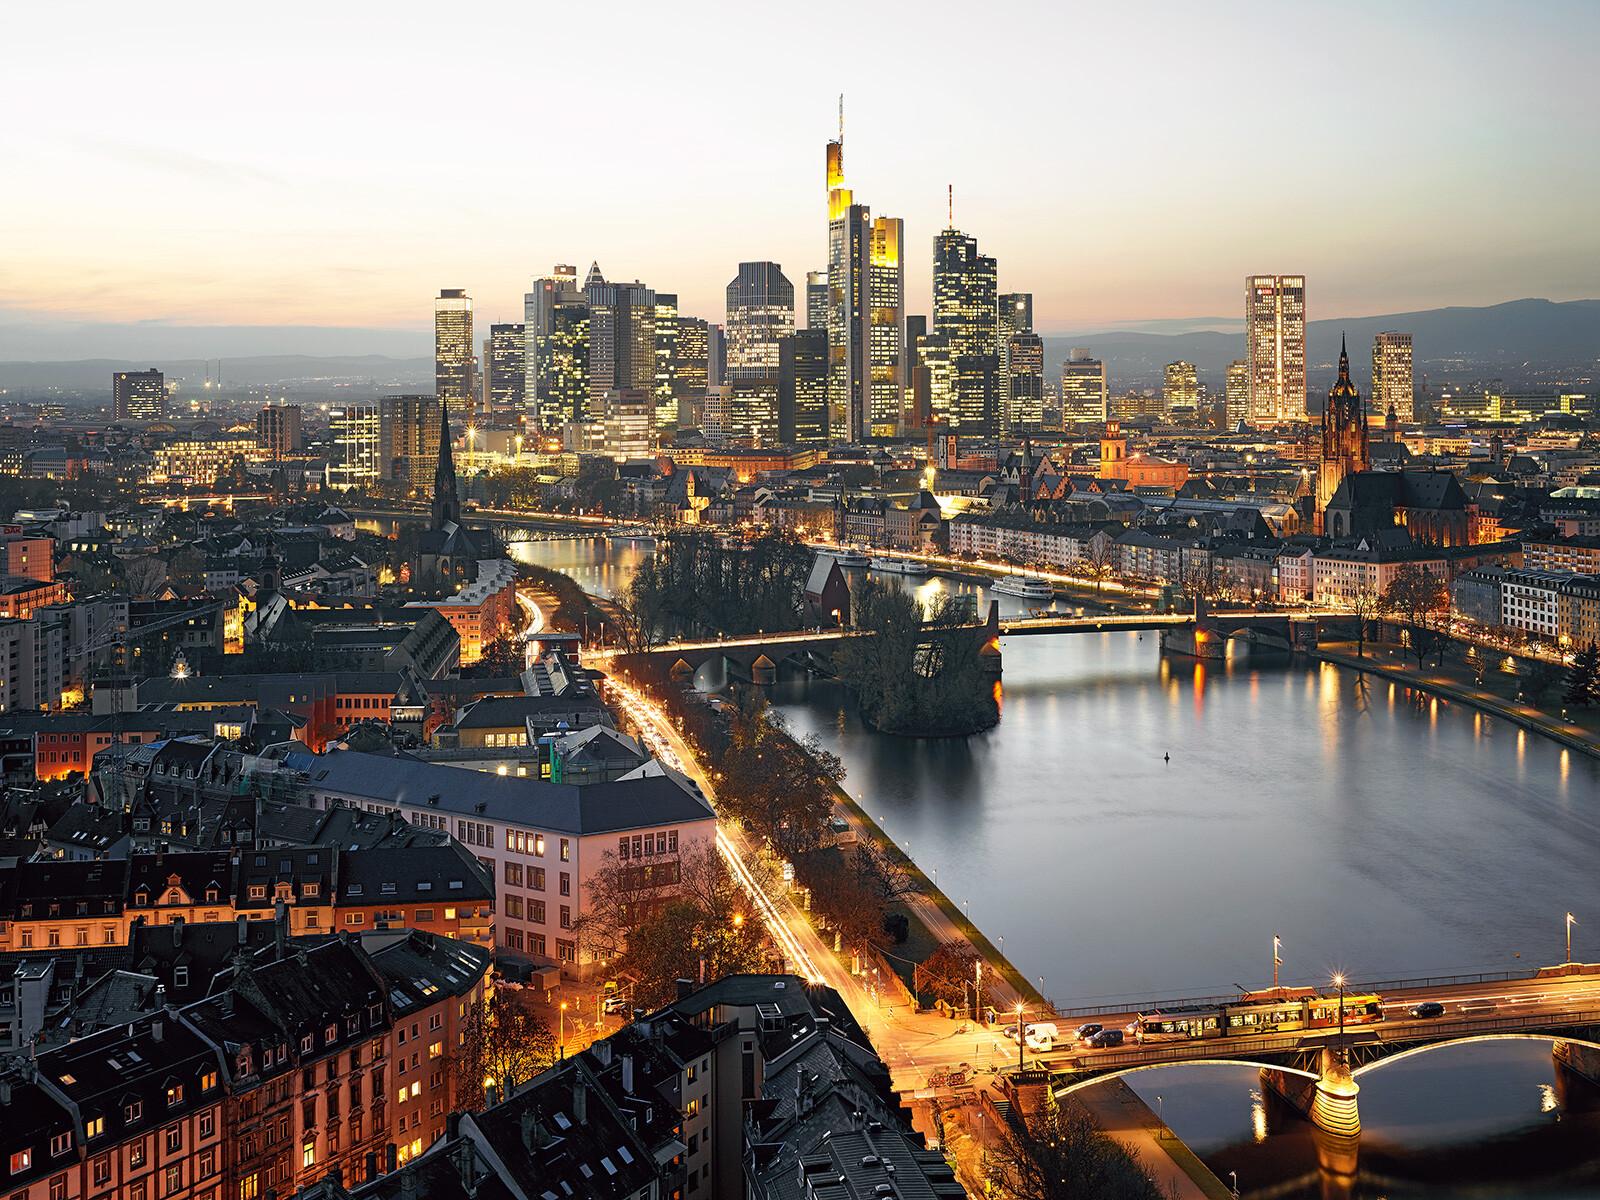 Urban Nights VII - Horst & Daniel  Zielske